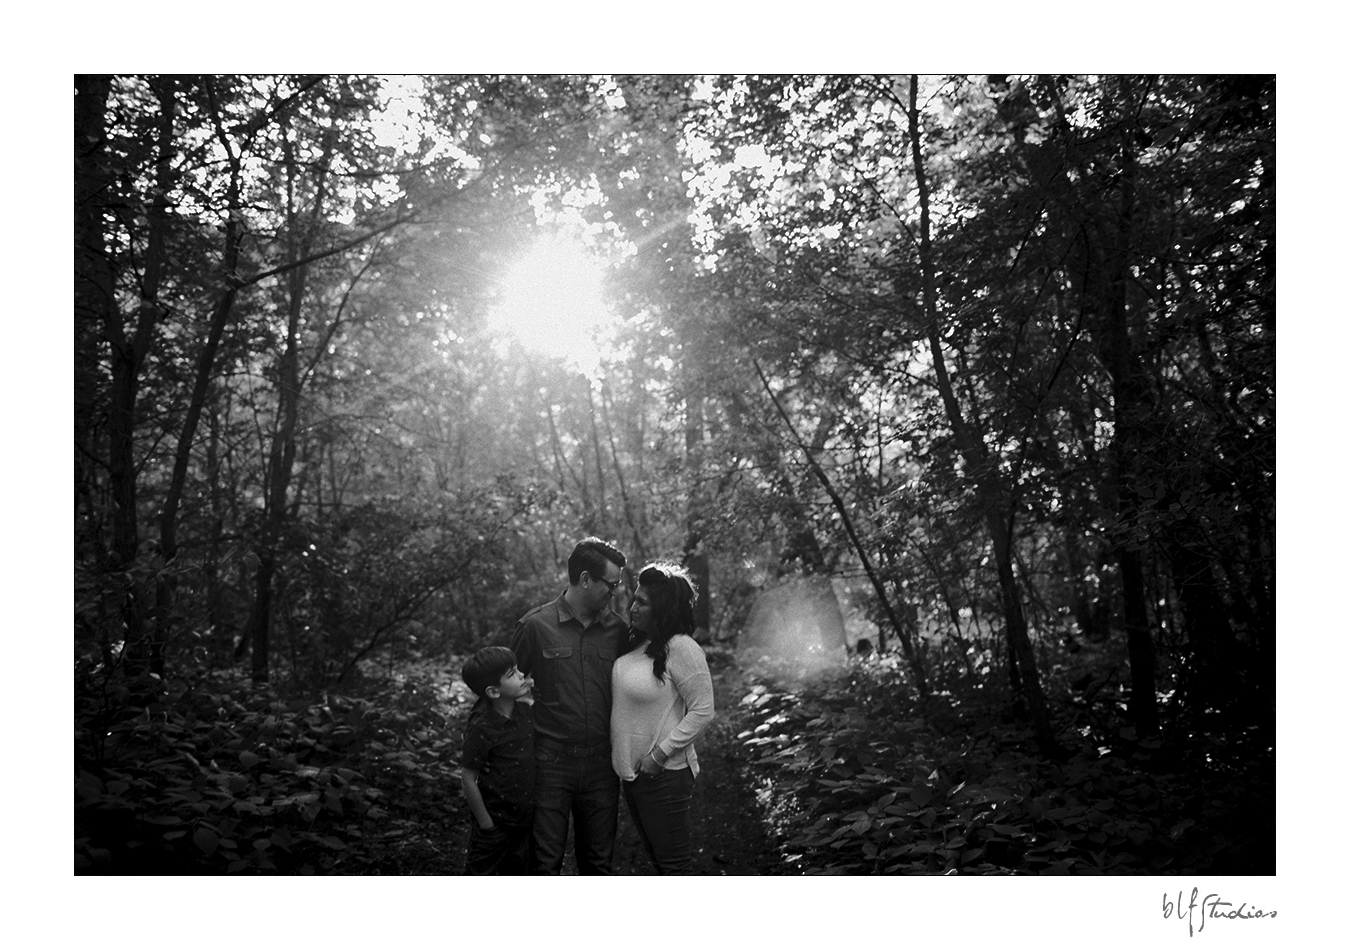 0001-blfStudios-engagement-photos-rebecca.jpg